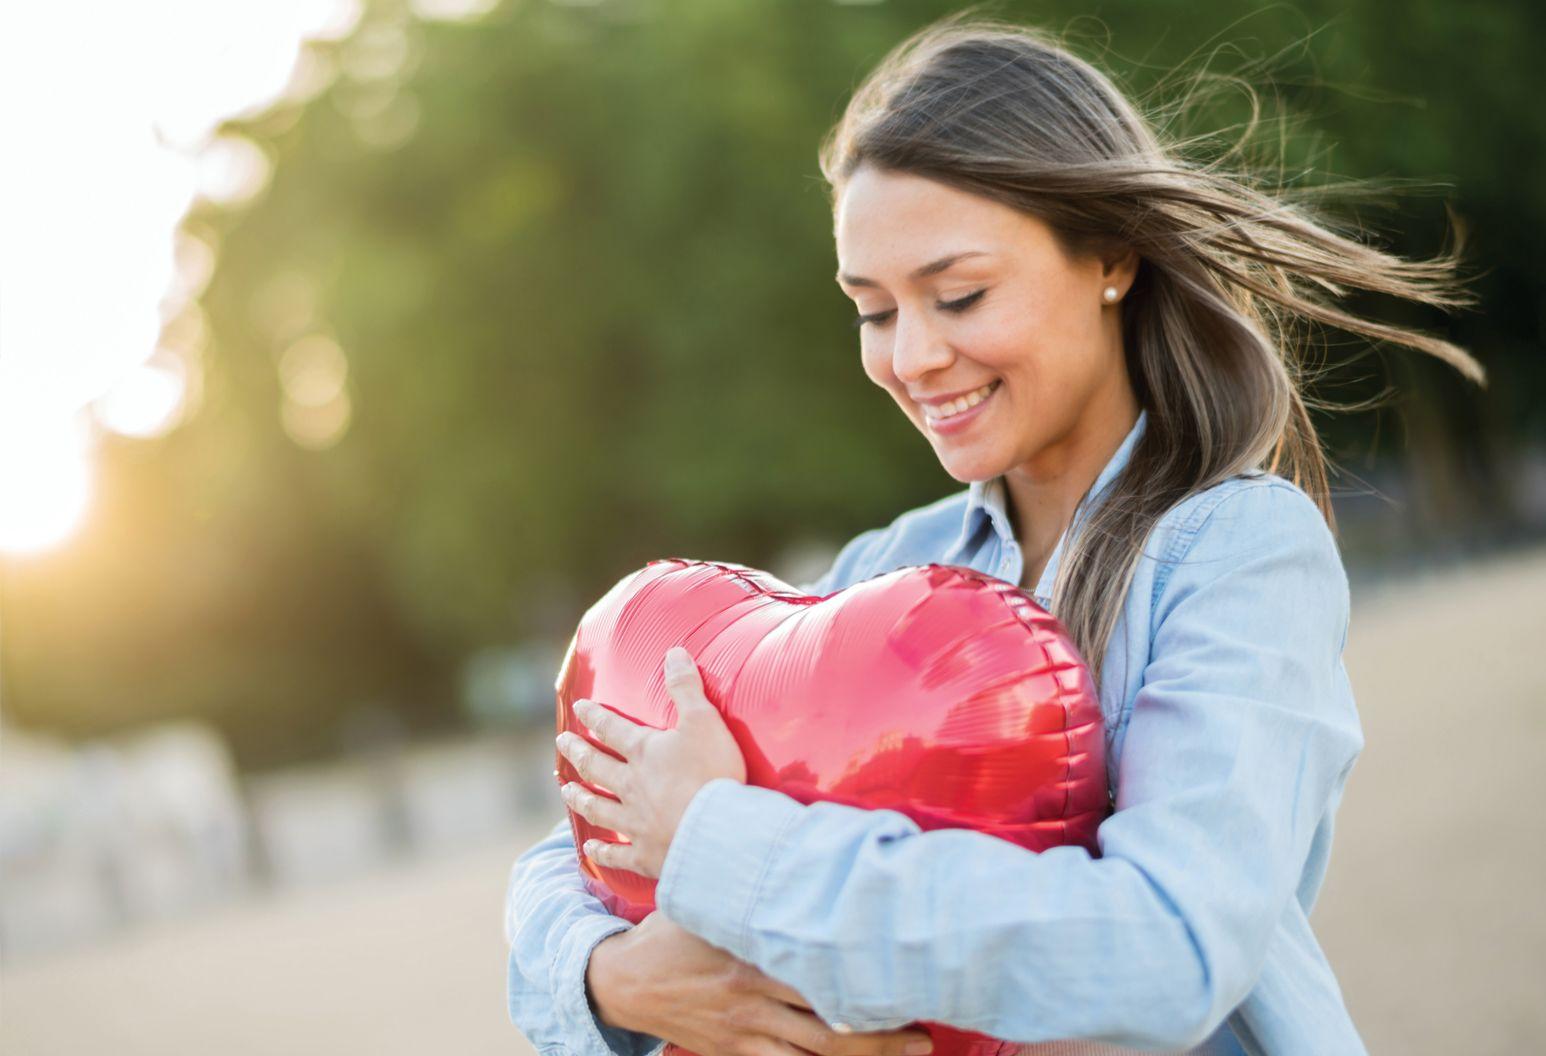 Woman embracing a heart shaped balloon.